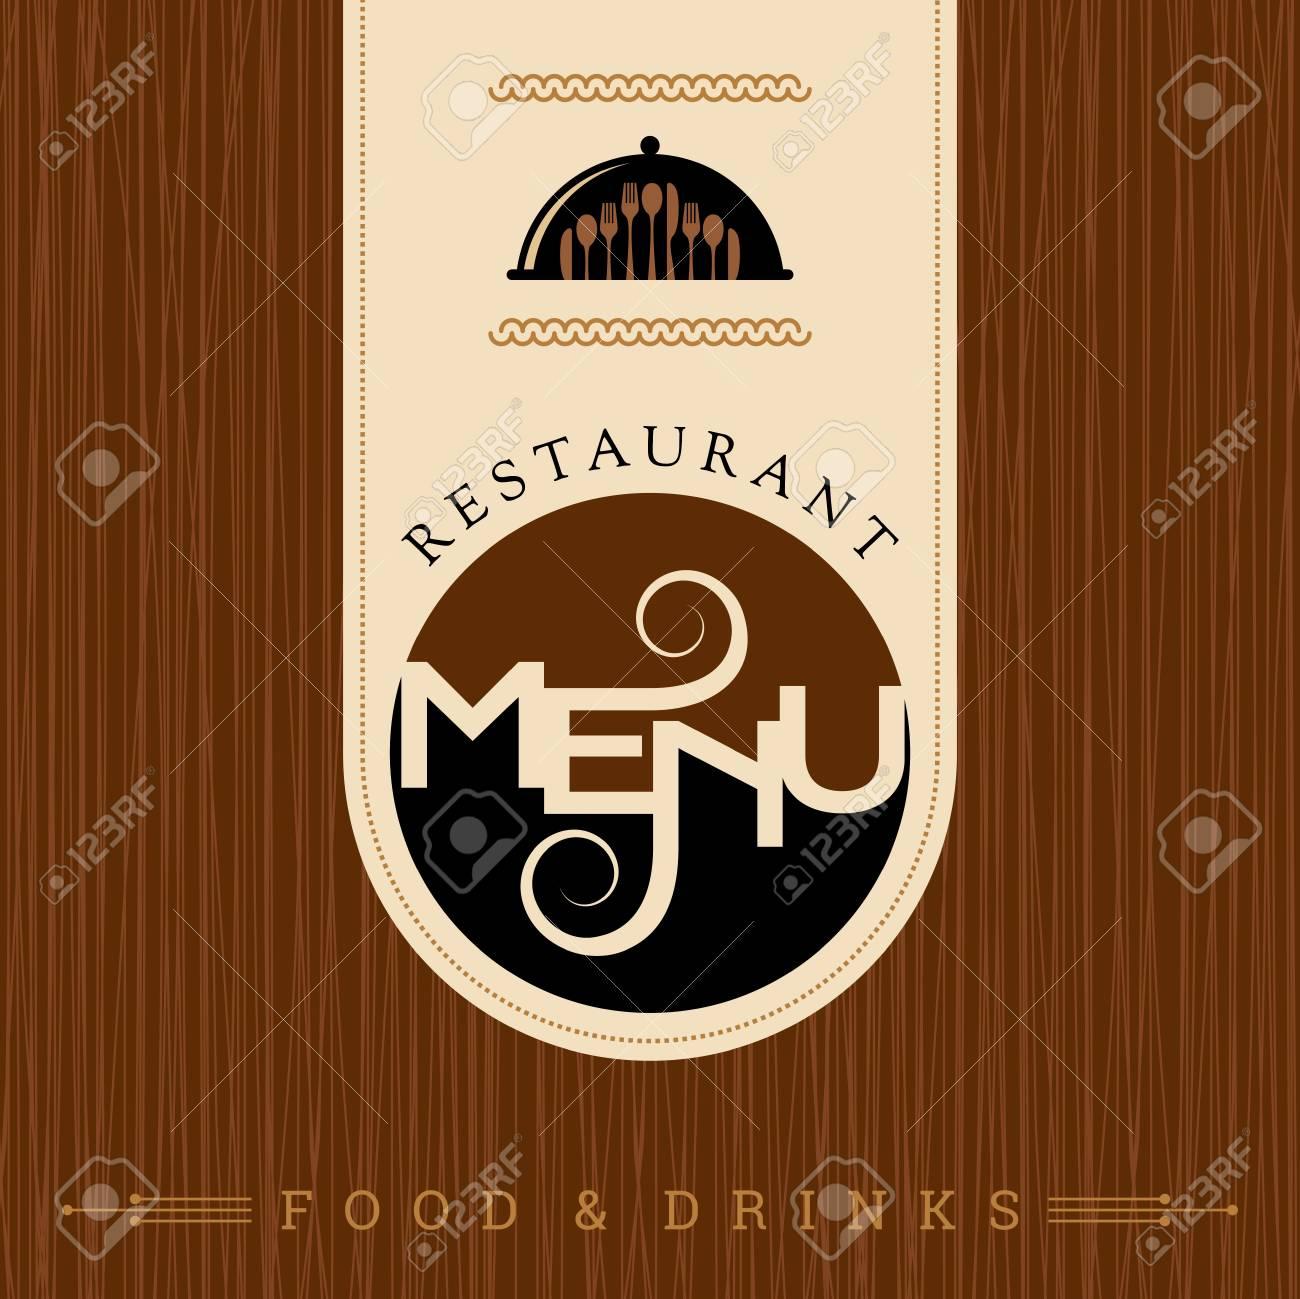 Restaurant Menu Card Design Template Creative Vector Royalty Free Cliparts Vectors And Stock Illustration Image 62247999